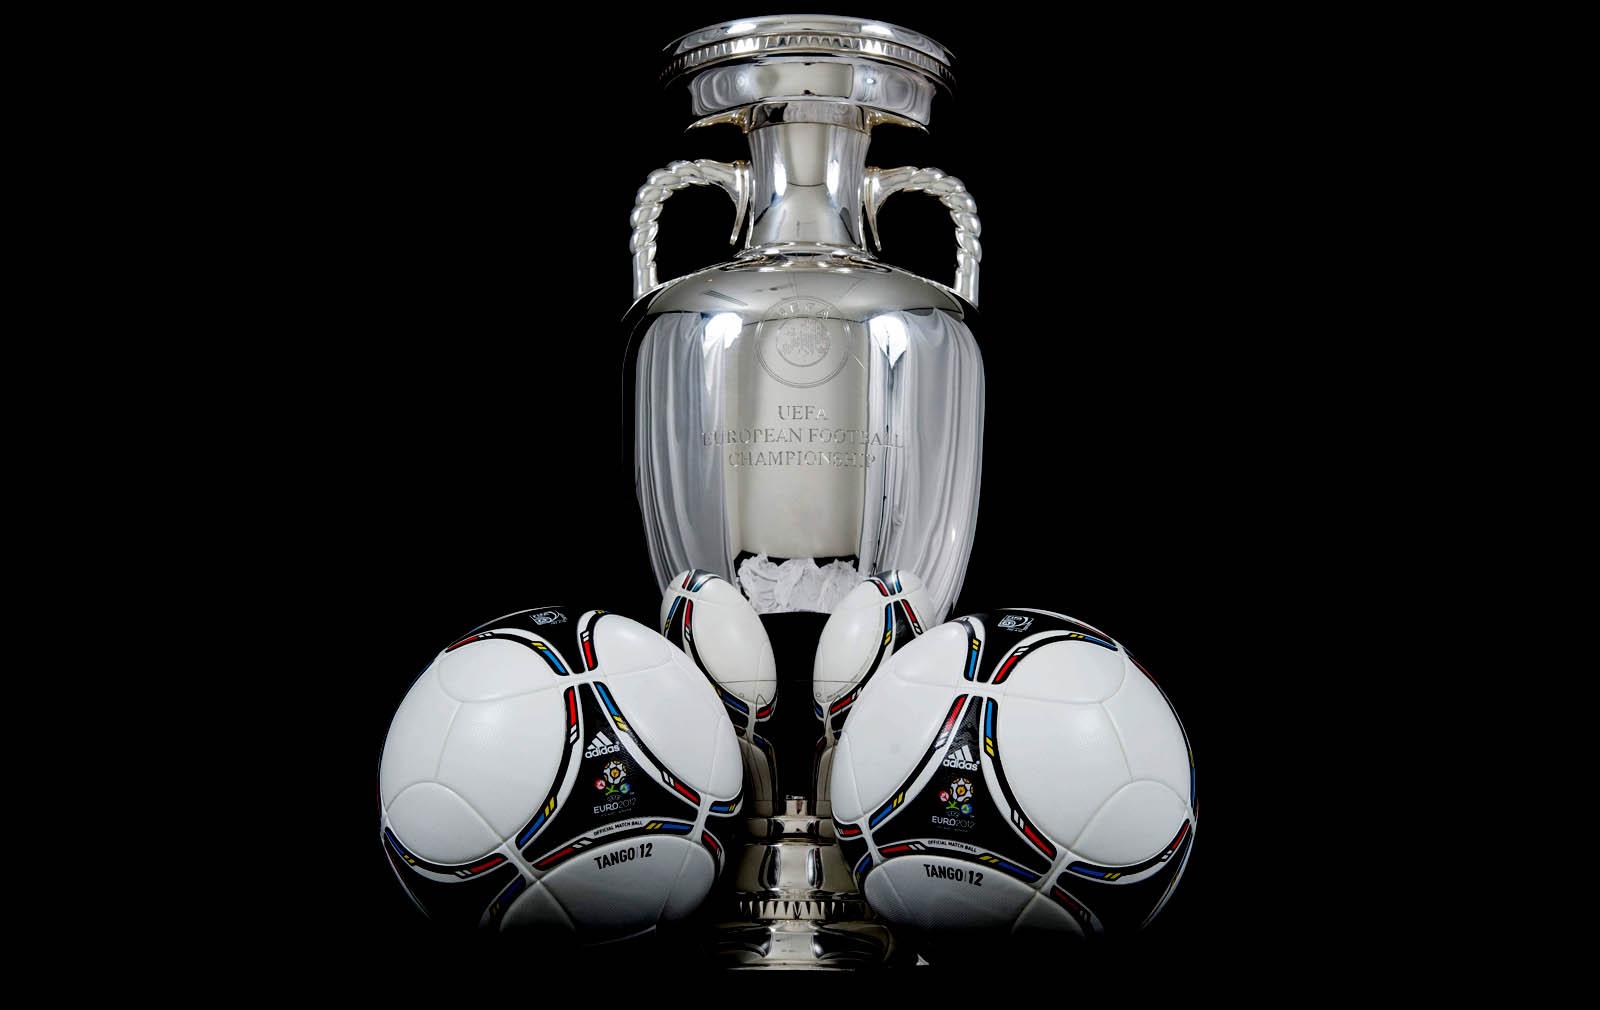 http://4.bp.blogspot.com/-WP-FlZzY5Aw/T50h2vo1QQI/AAAAAAAABdI/xHevBiPqKO8/s1600/Uefa_Euro_2012_Cup_and_Official_Tango_Matchballs_HD_Wallpaper-Vvallpap